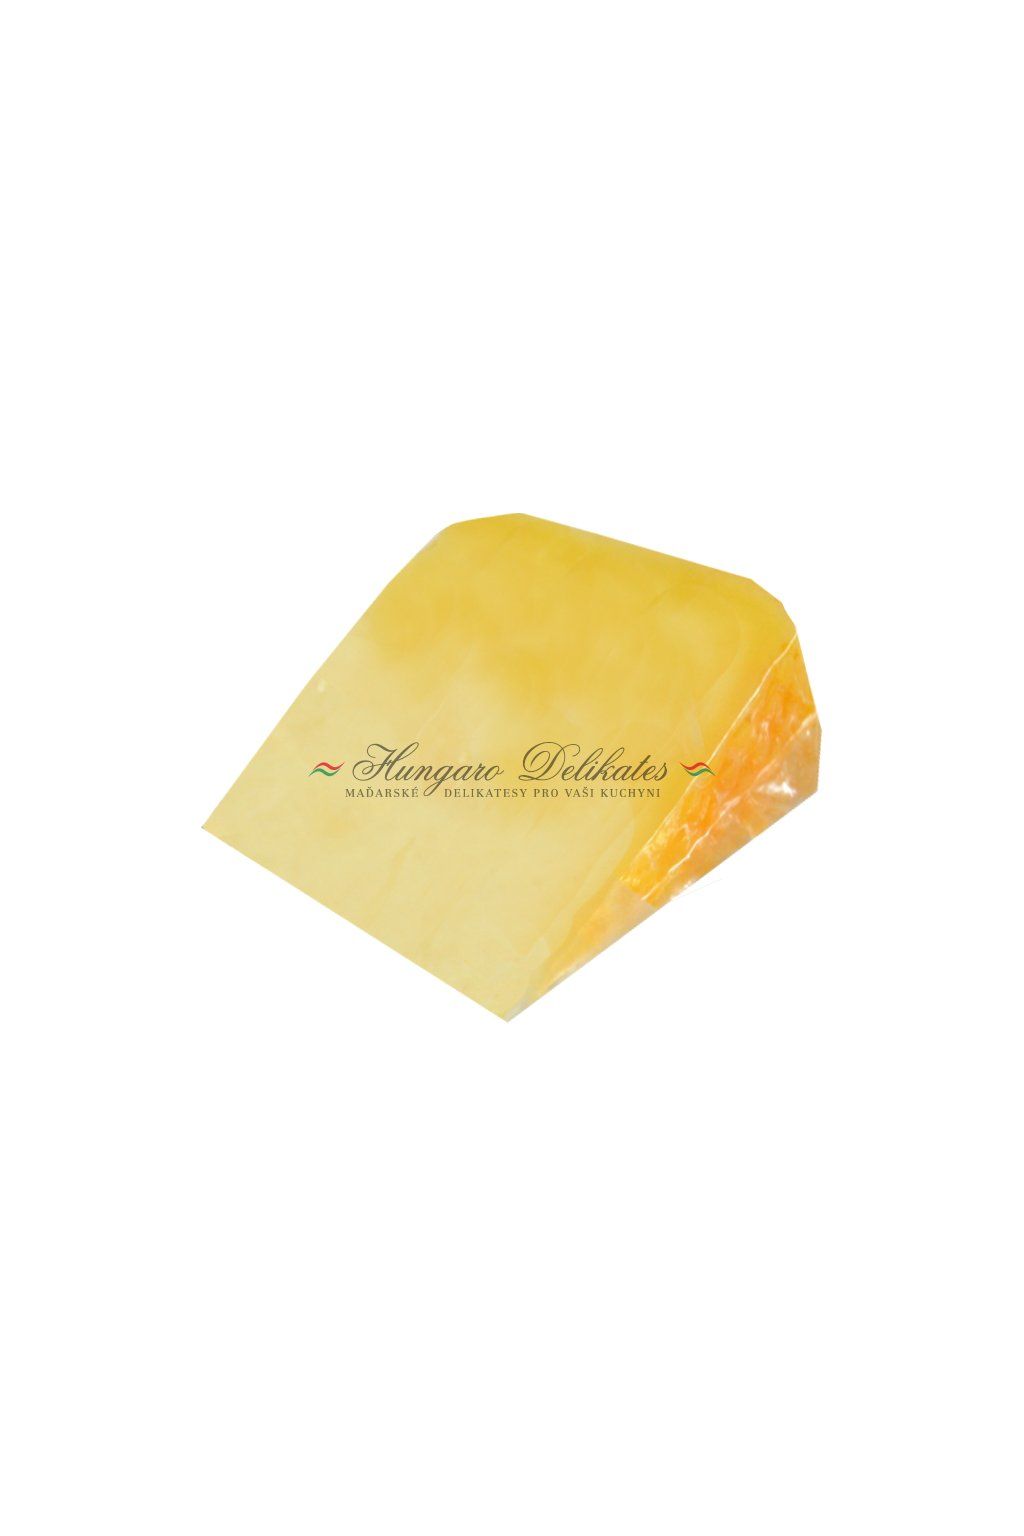 Plachtinske zlato rez 840px